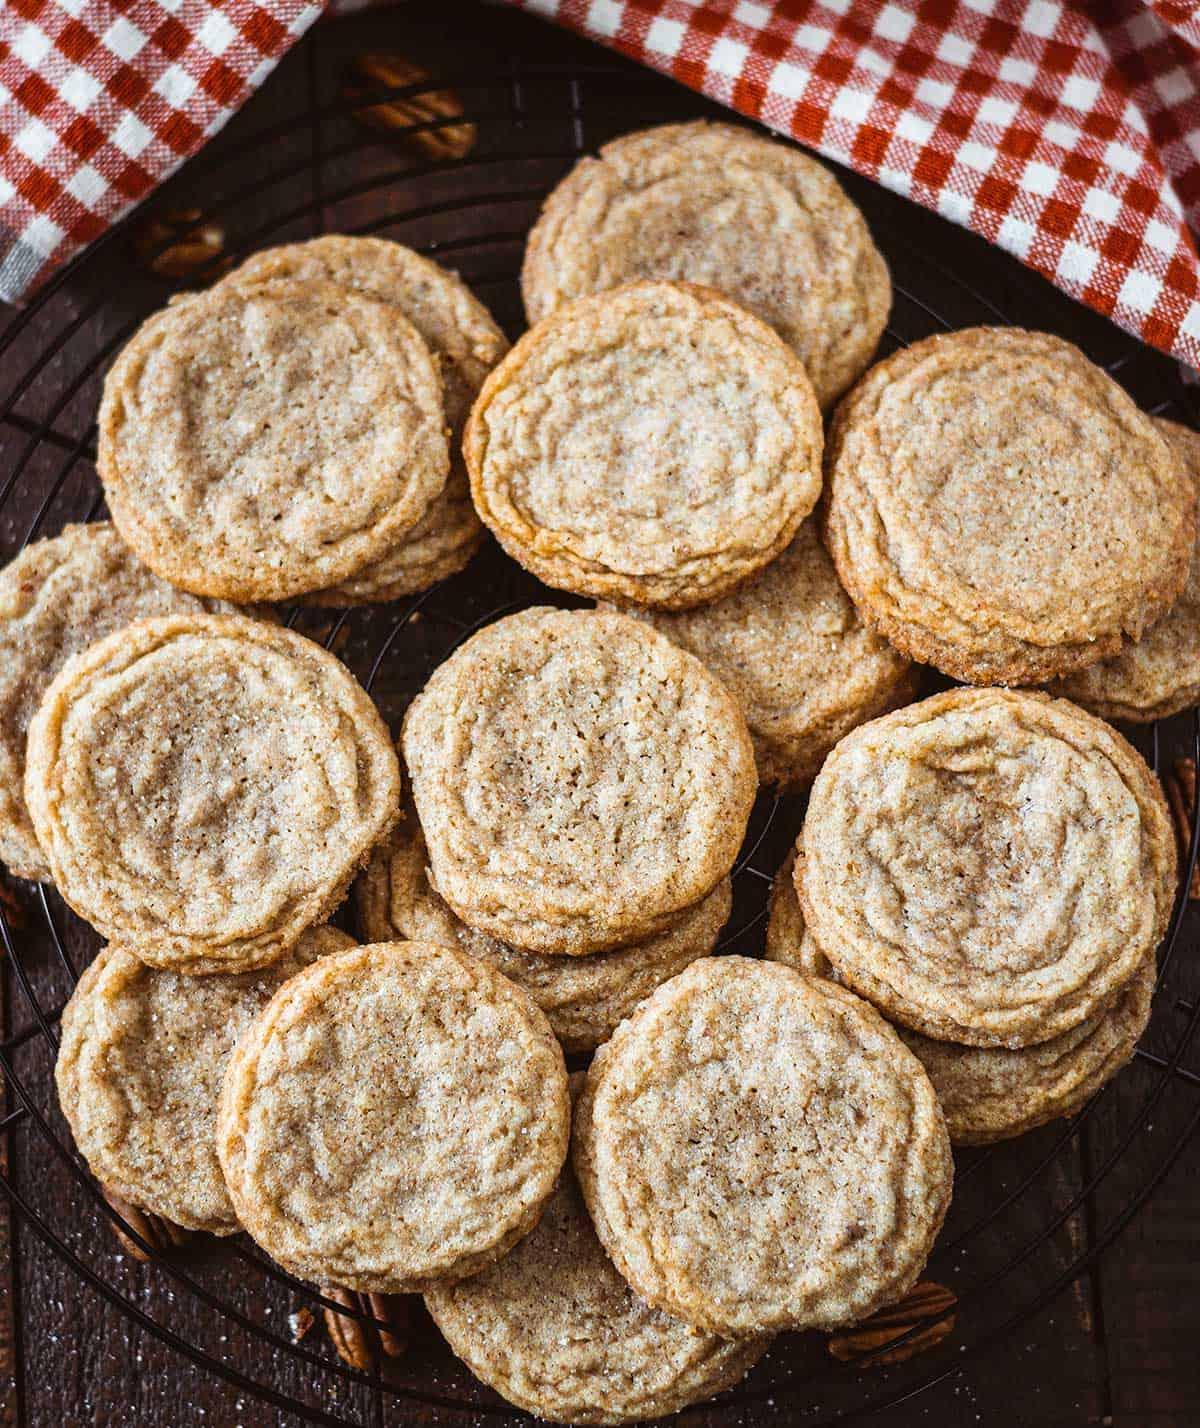 Overhead shot of pecan butter cookies on a wire baking rack.